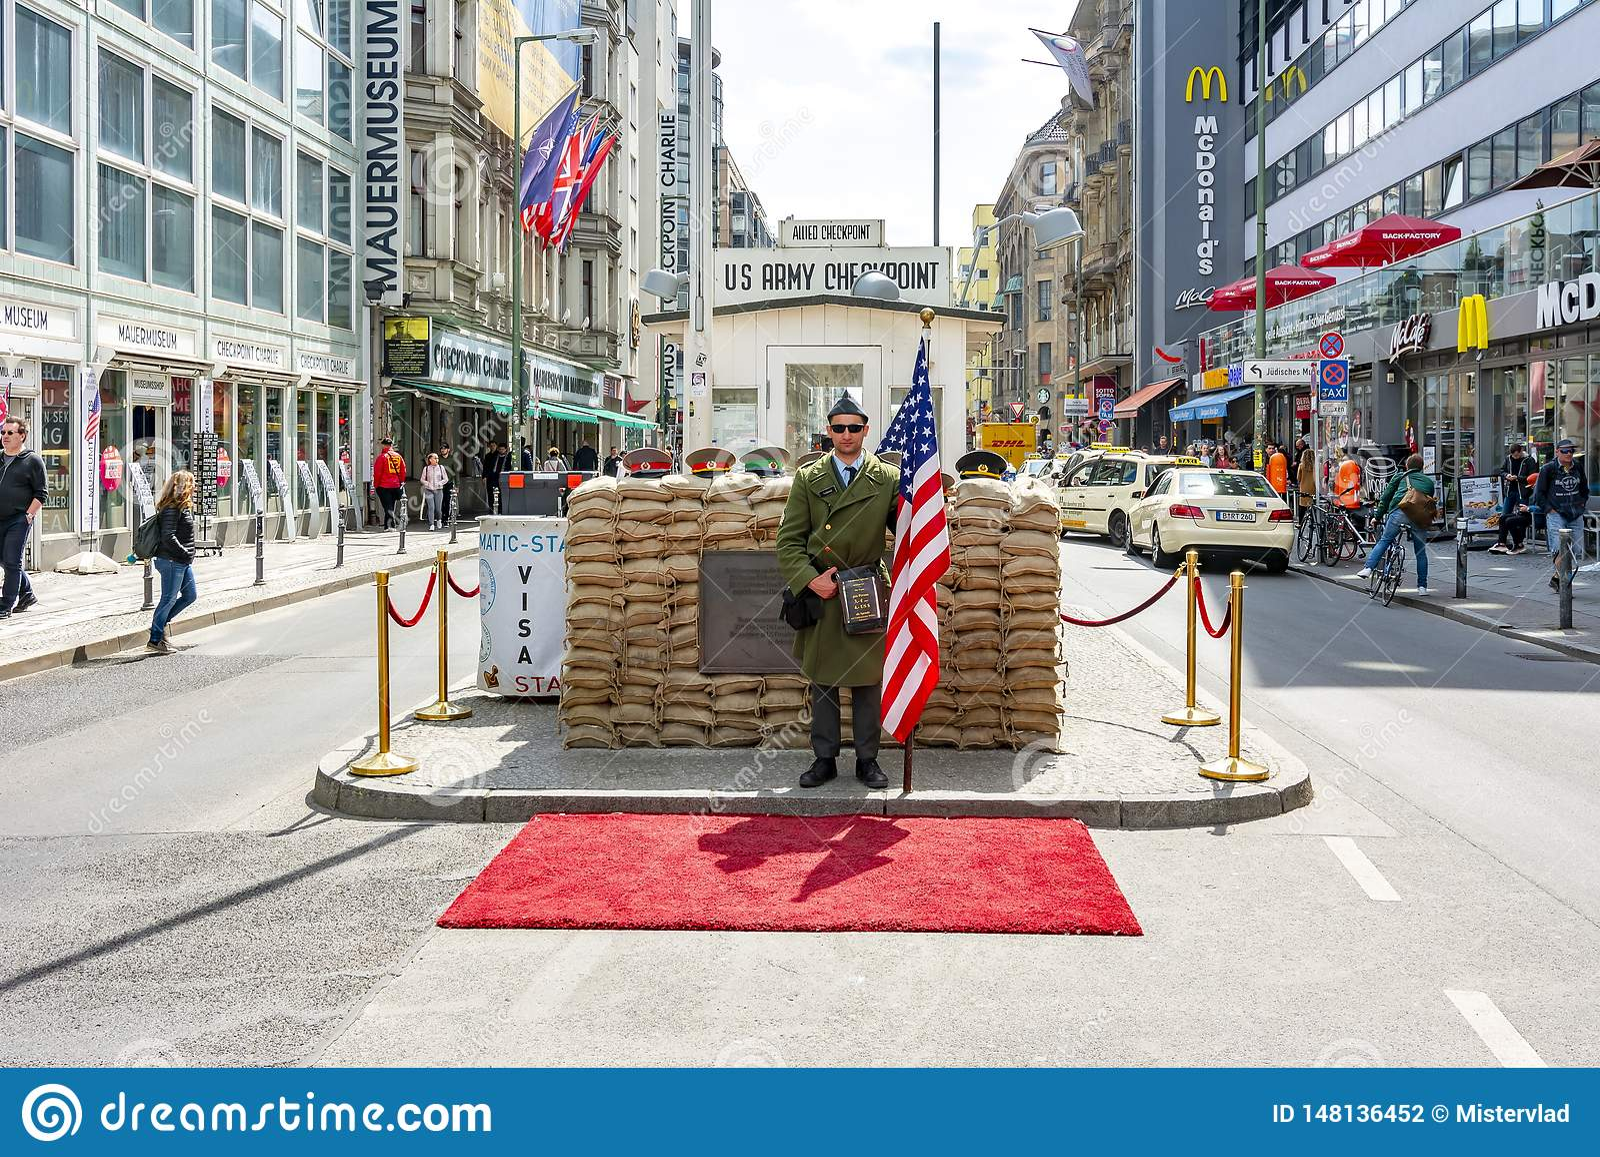 Checkpoint Charlie zabytek w Berlin, Niemcy